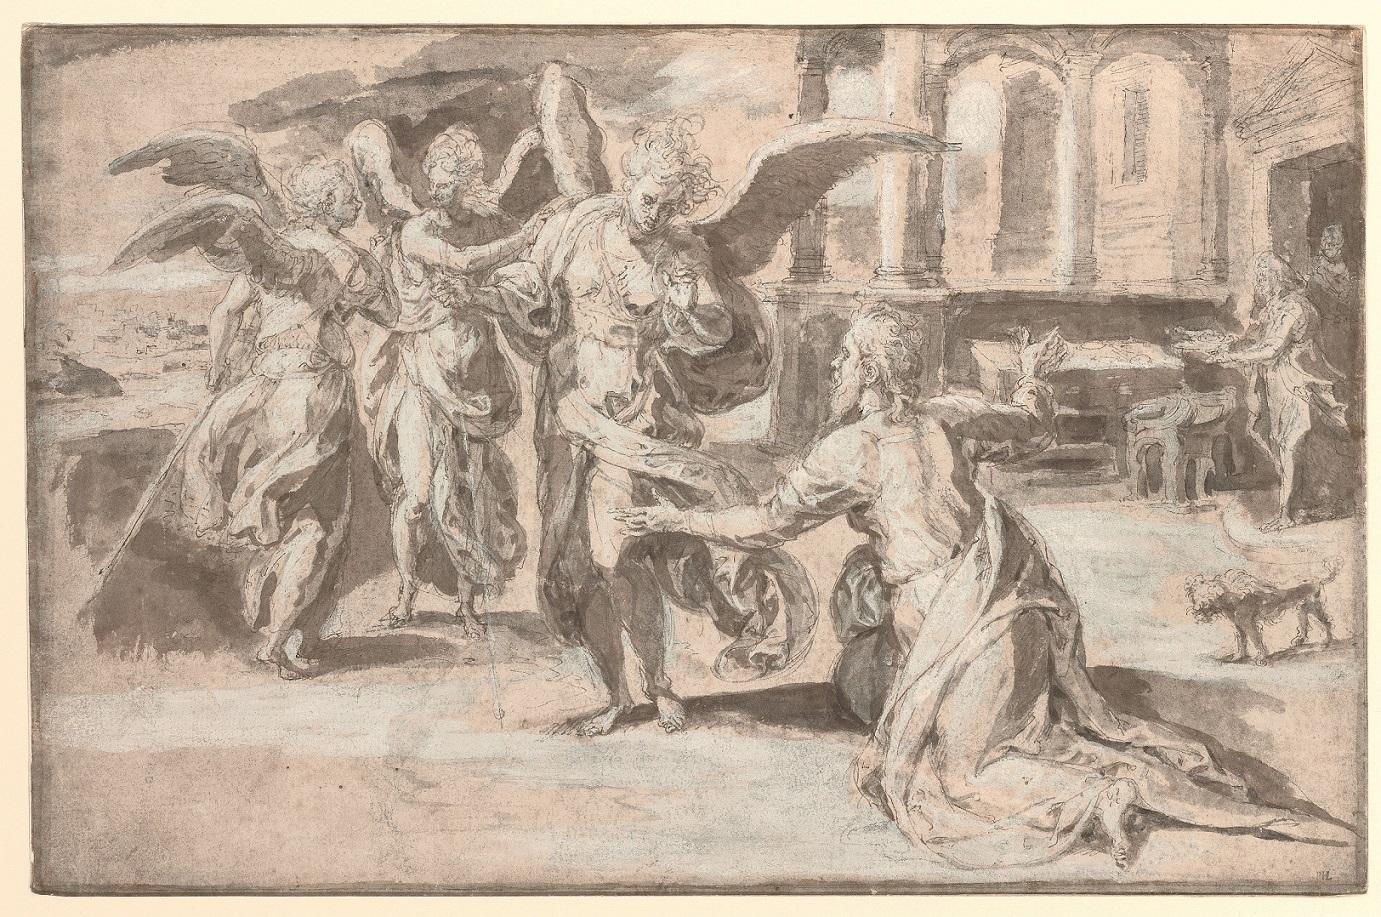 Fig. 2: Chrispijn van den Broeck (1524-1590), <em>Abraham and the Three Angels</em>, 1580<br>Szépművészeti Múzeum, Budapest